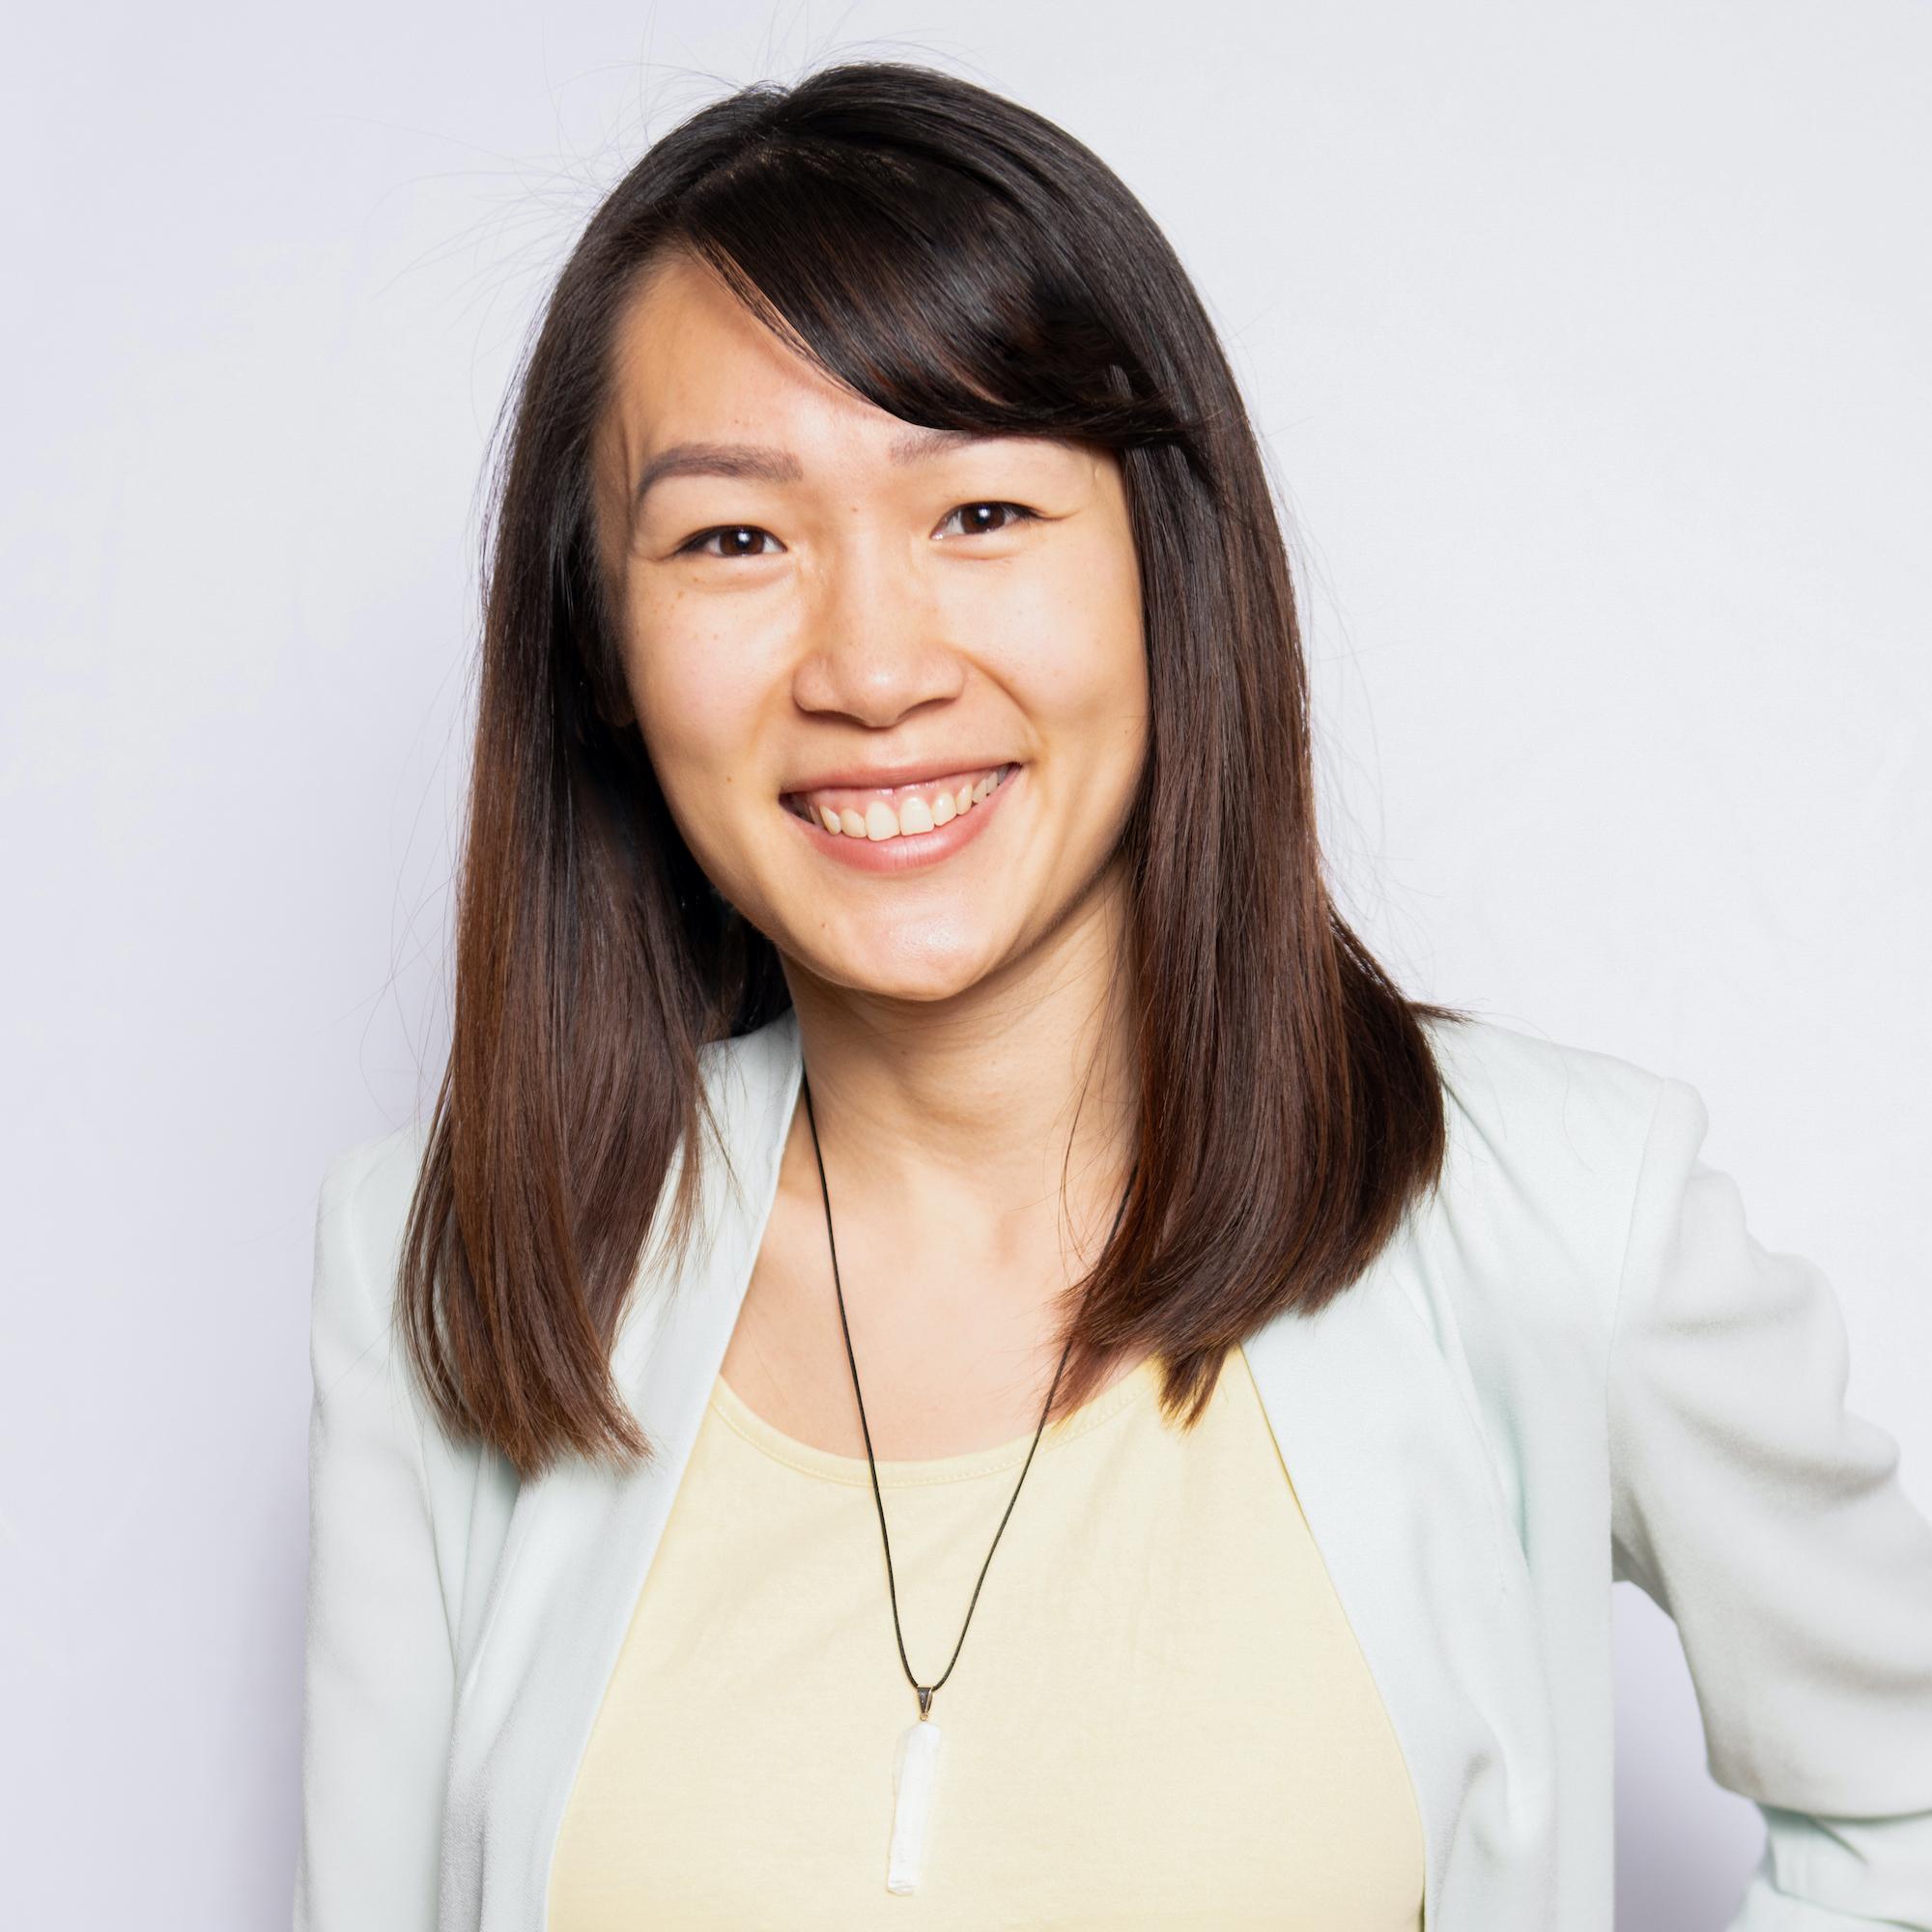 Chenny Xia